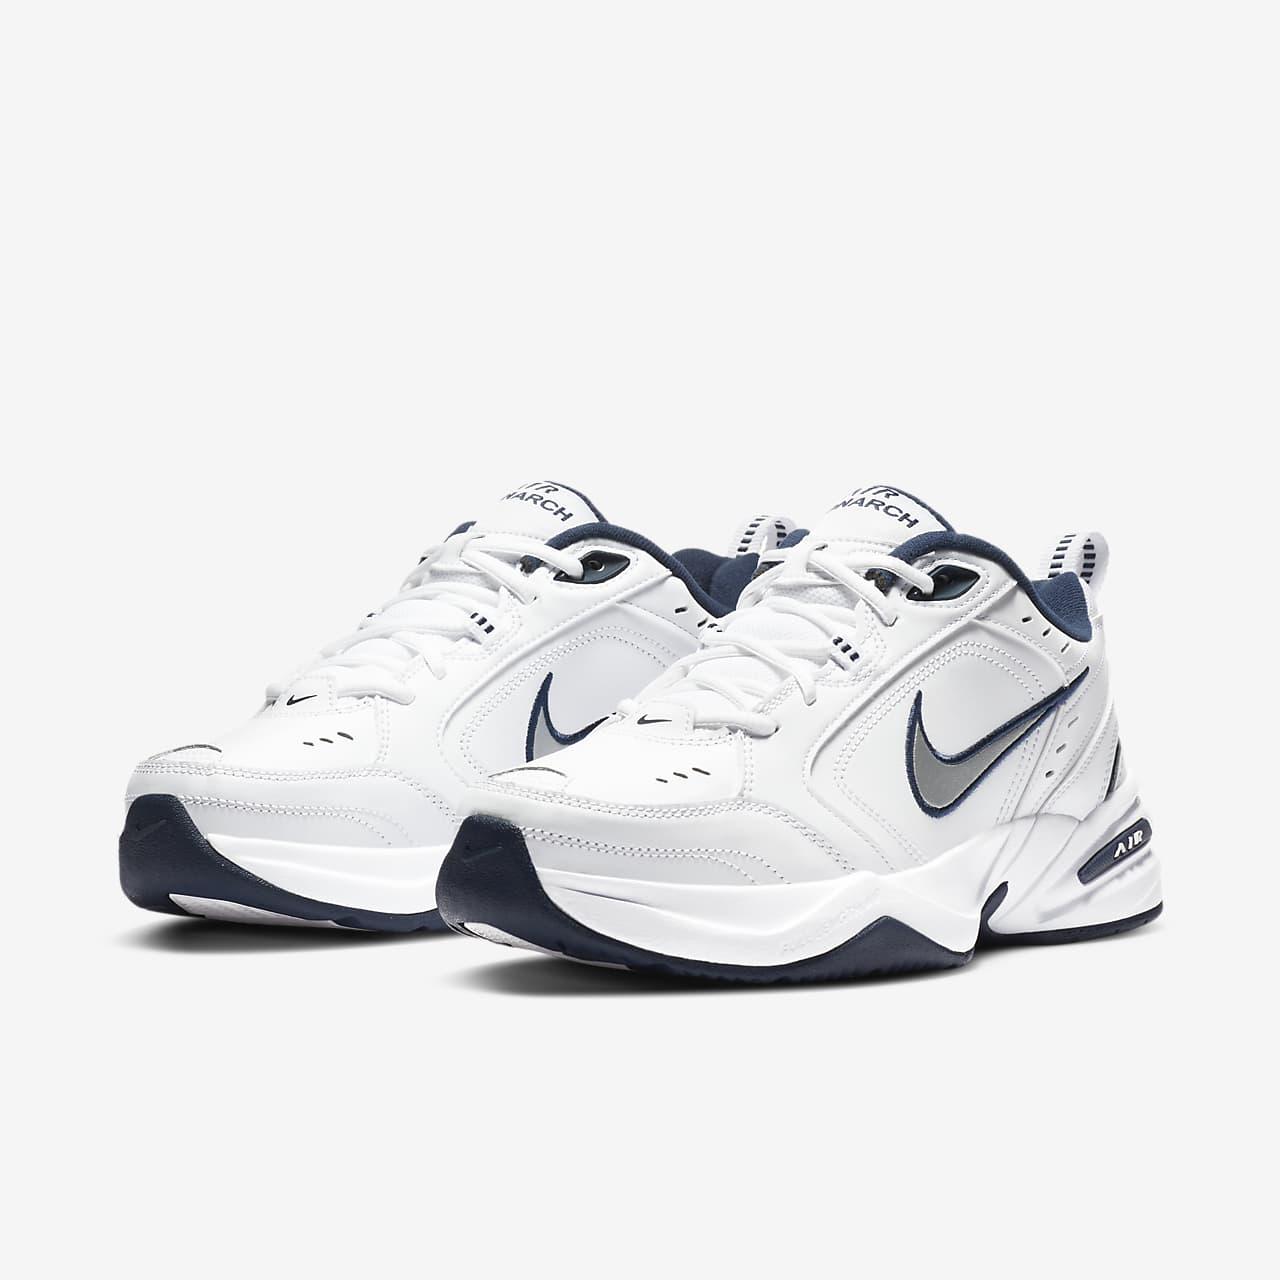 b32e526e ... Кроссовки для занятий в зале/на каждый день Nike Air Monarch IV